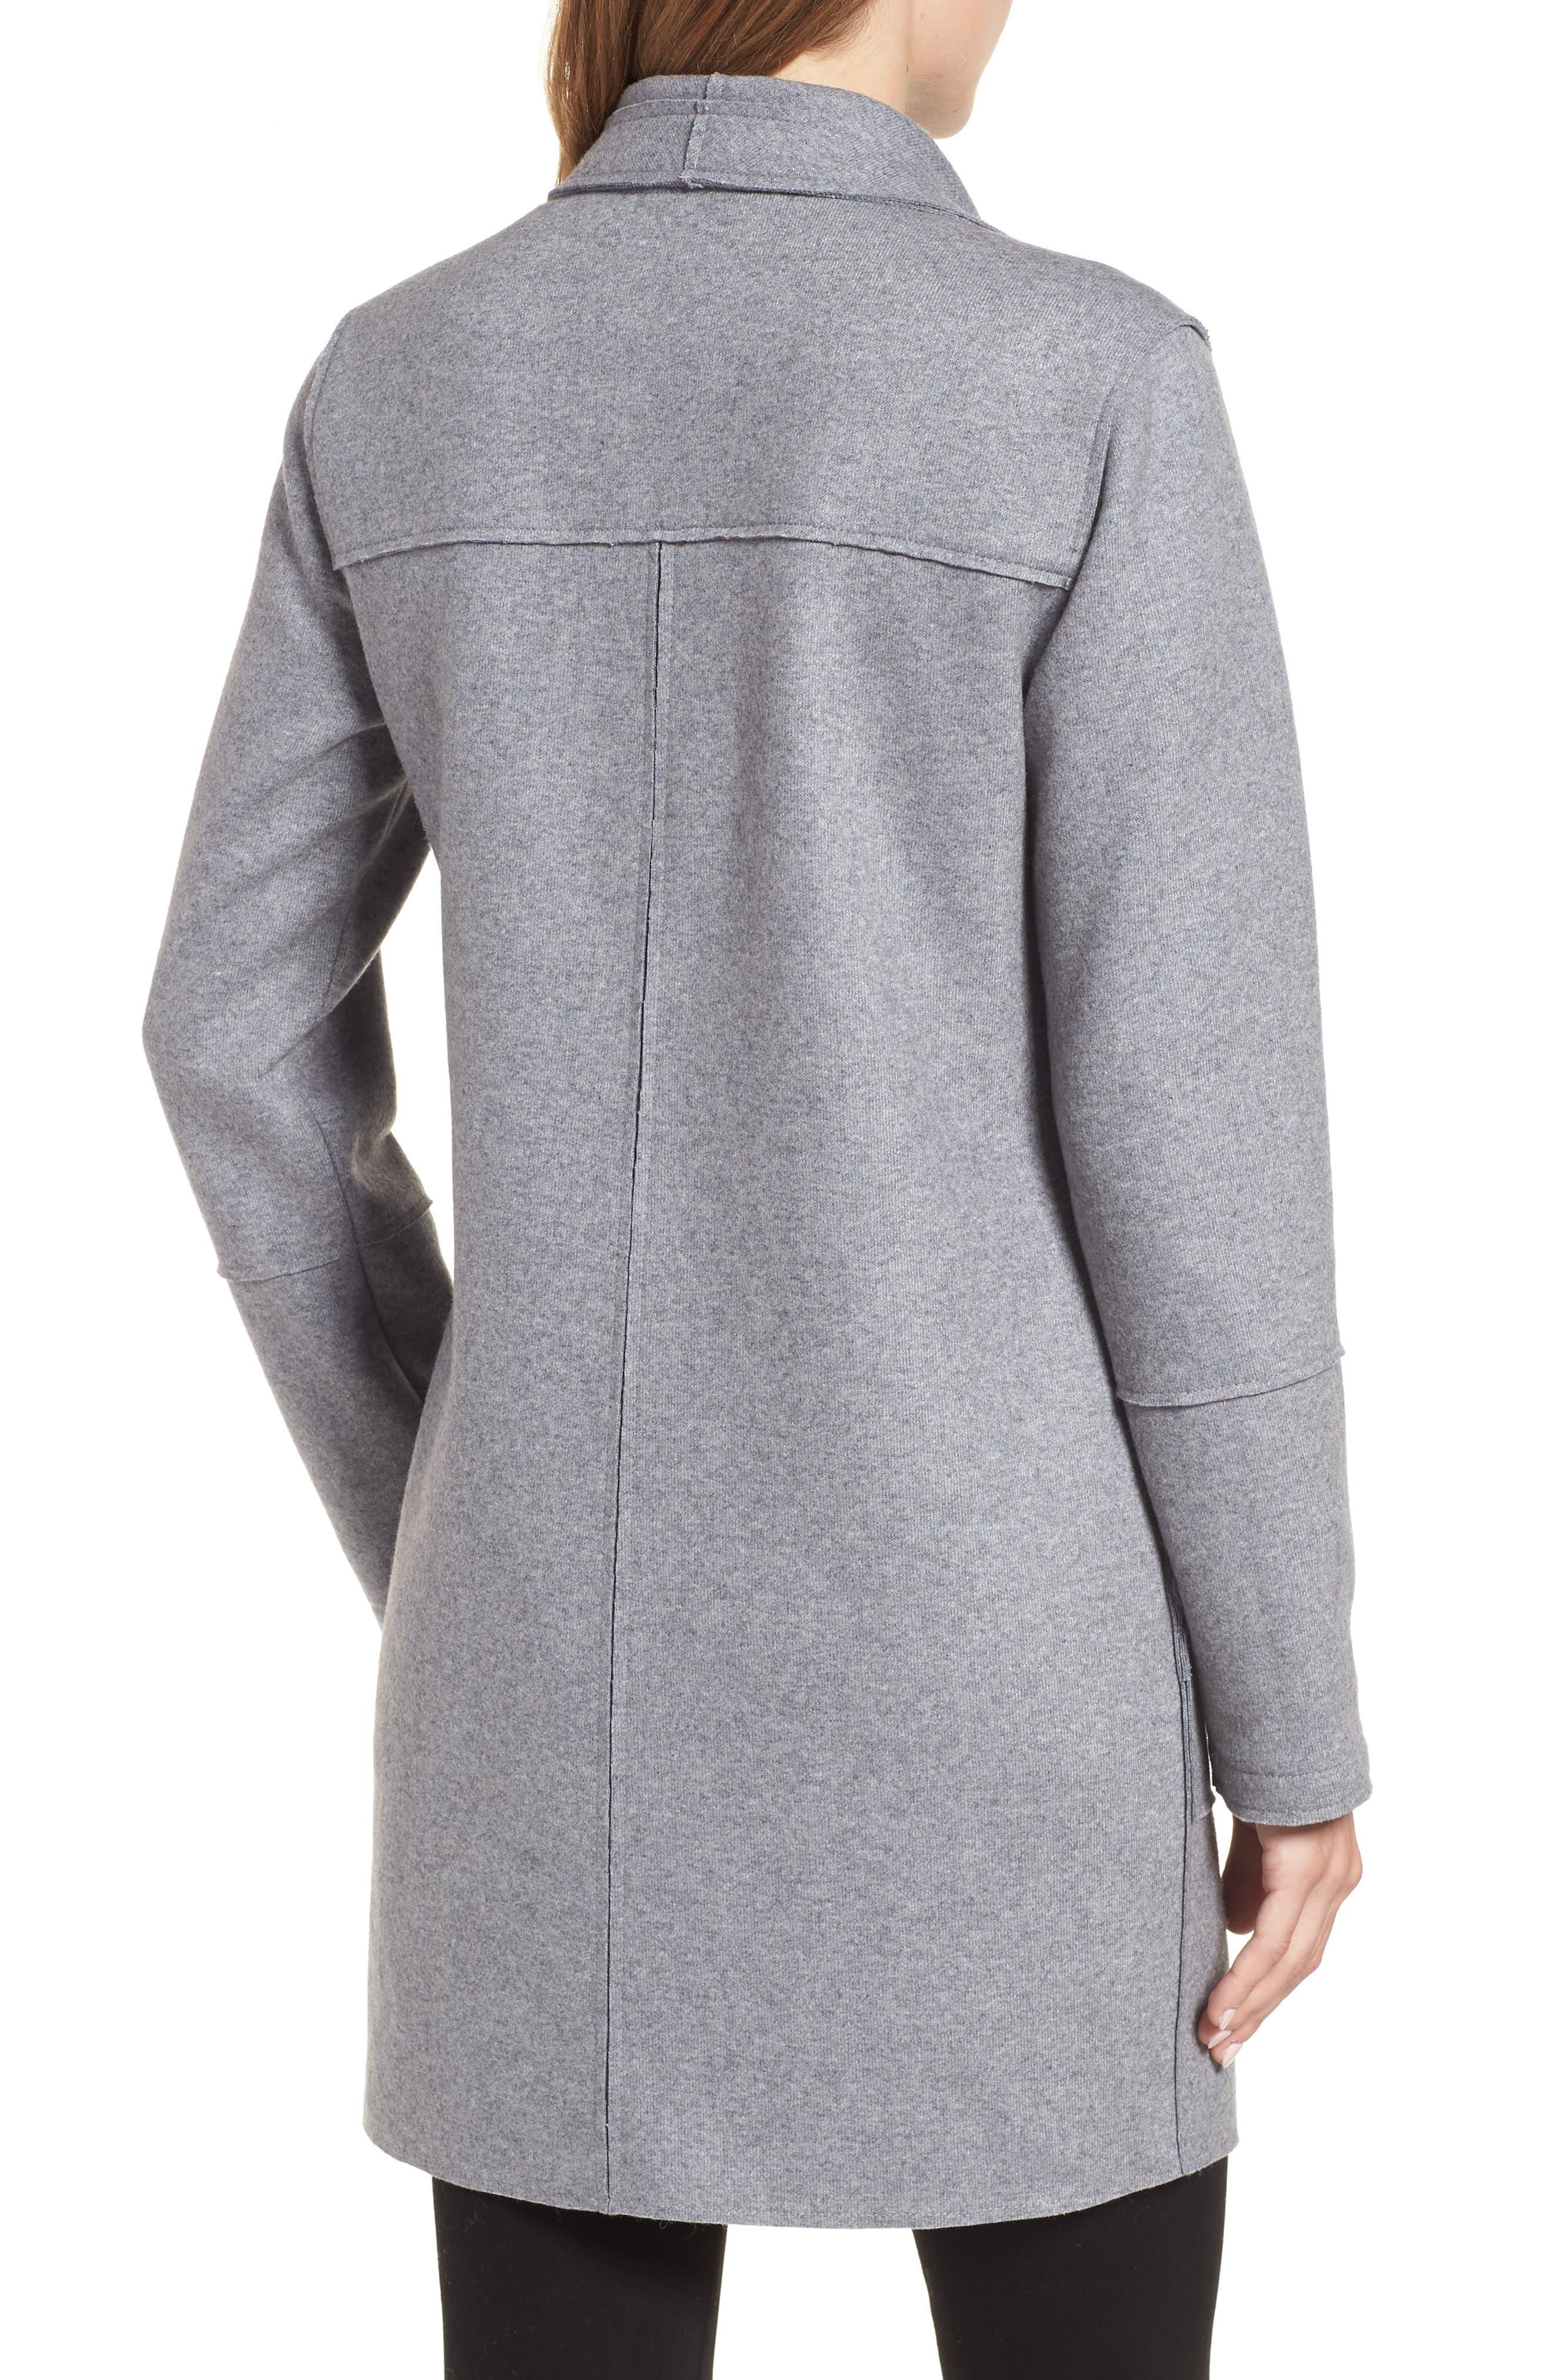 Envelope Collar Wool Blend Knit Coat,                             Alternate thumbnail 2, color,                             LIGHT GREY